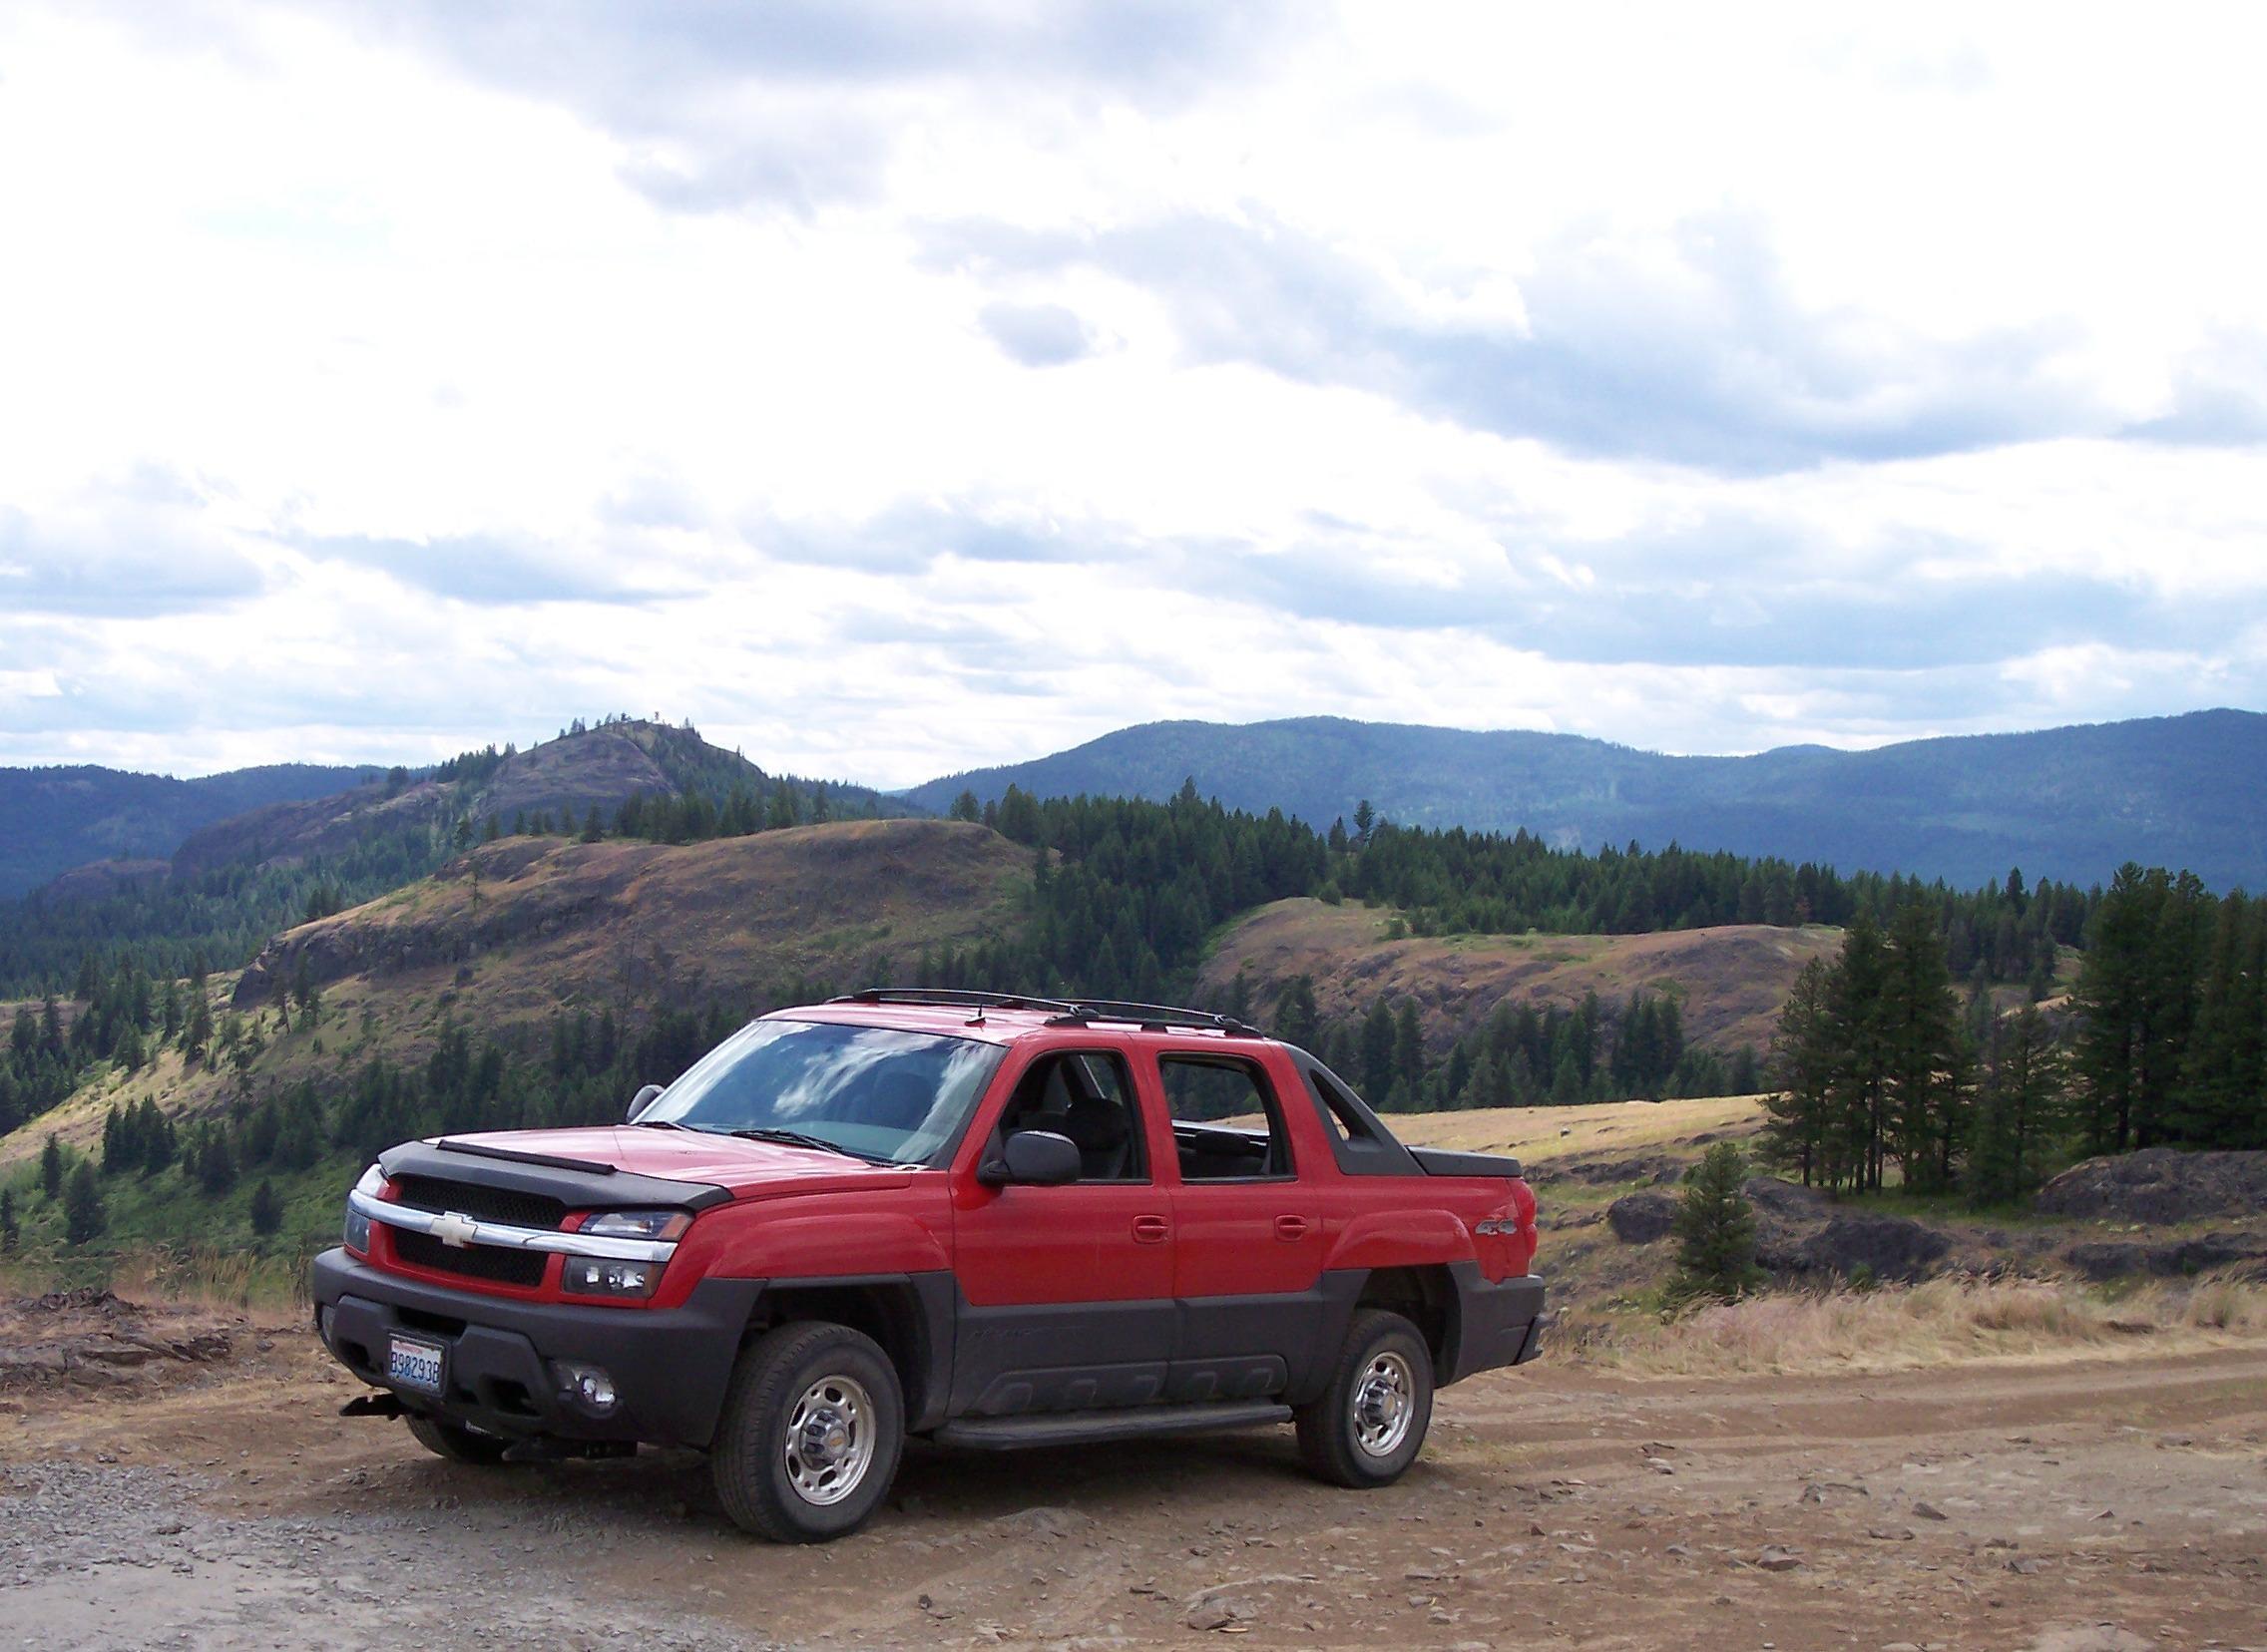 Chevrolet-Avalanche-wallpaper-wp4602673-2